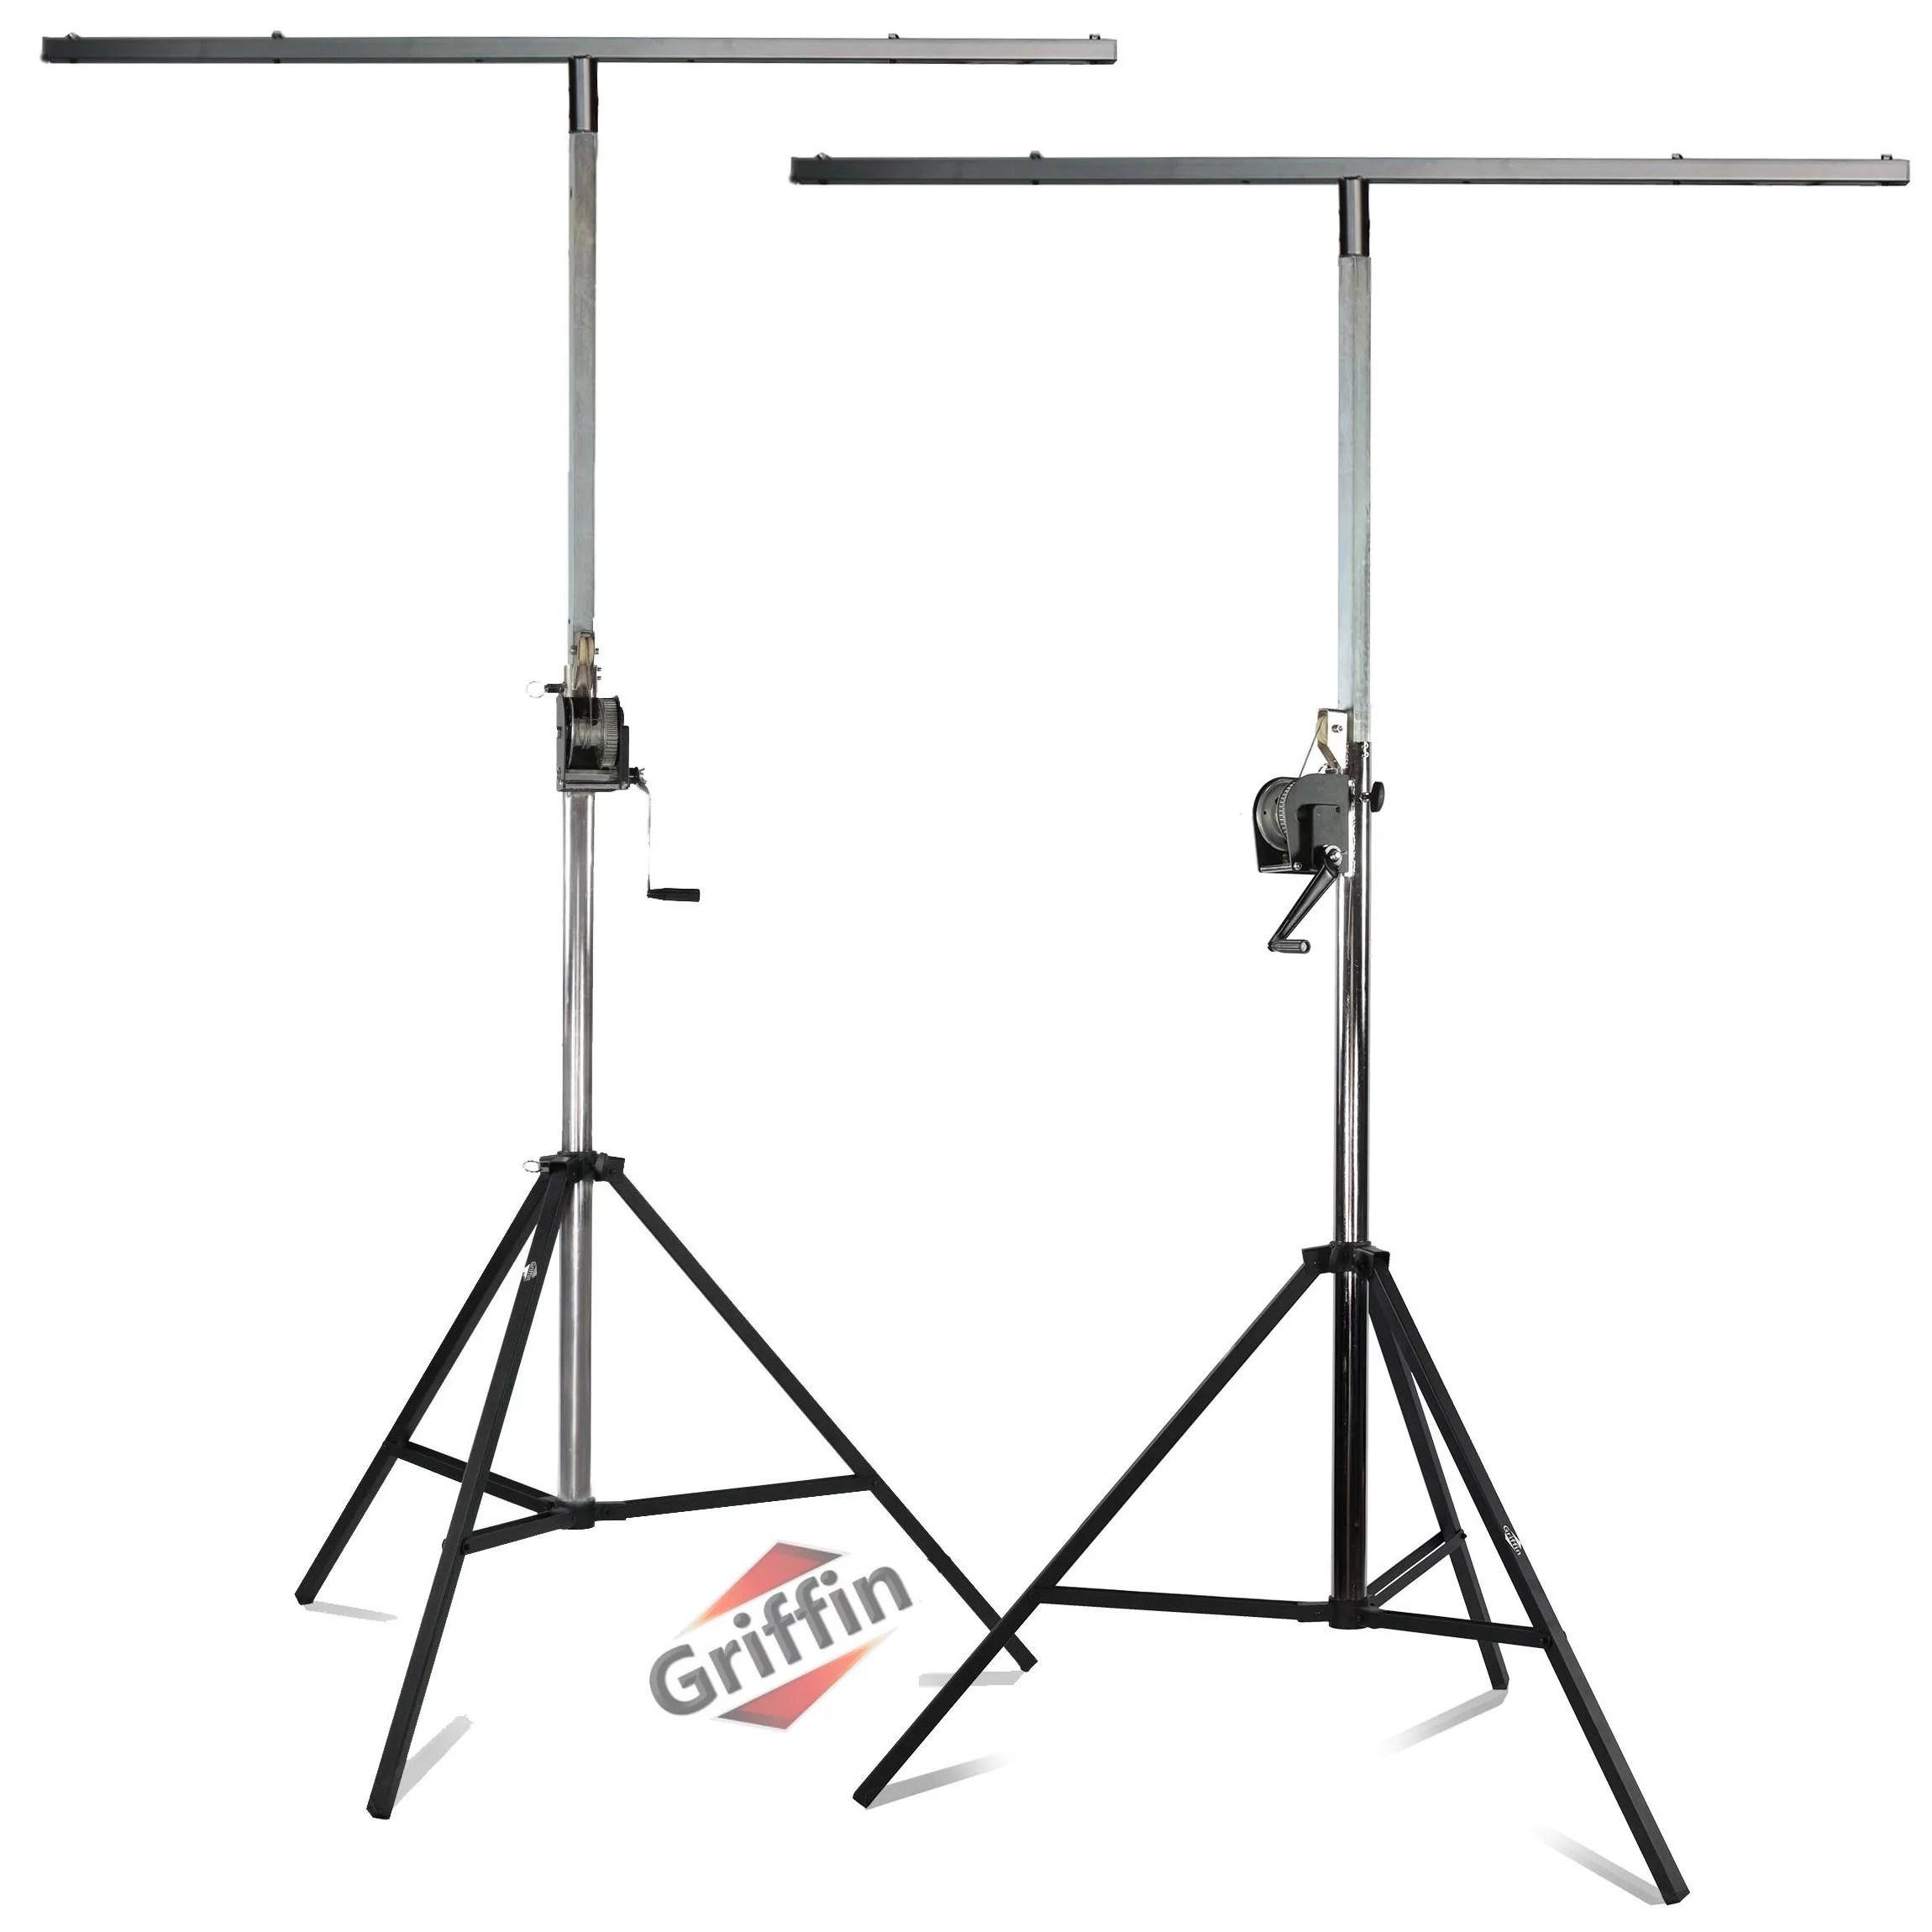 crank up light stands 2 pack stage lighting truss system by griffin portable speaker tripod platform rig adjustable trussing dj booth kit t bar